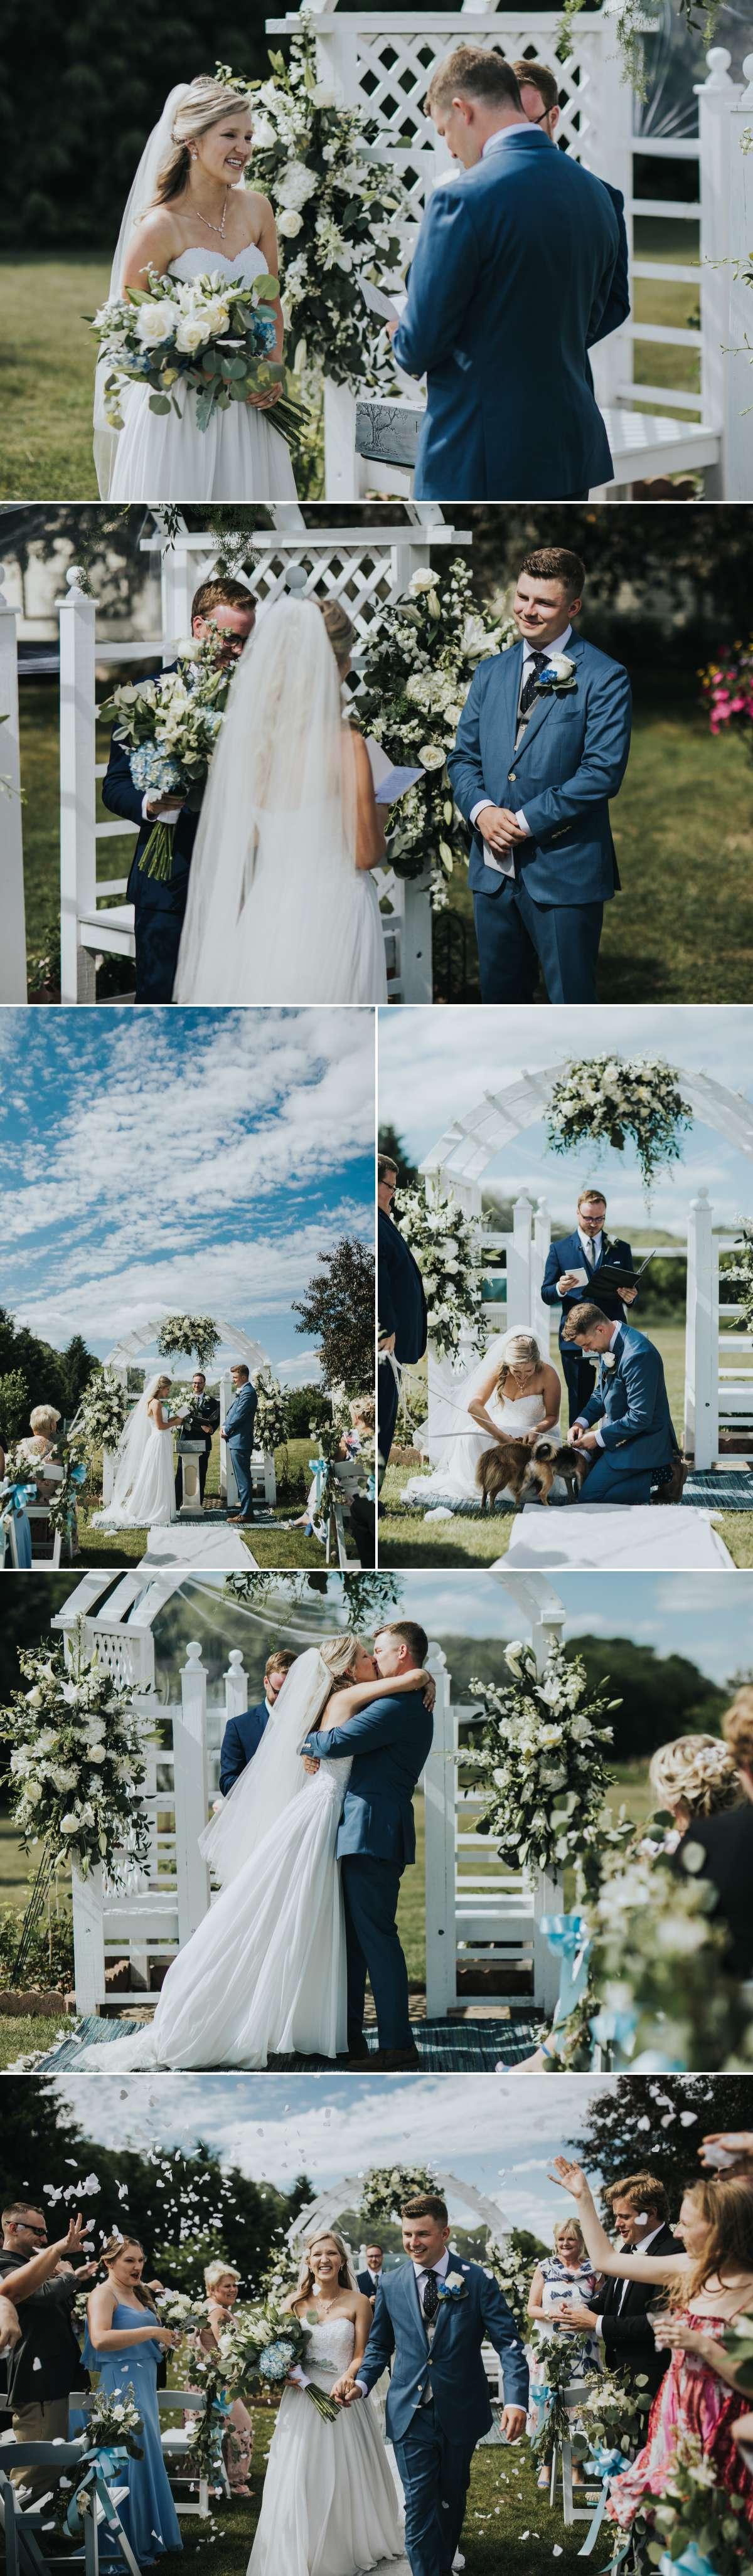 Minnesota Backyard Wedding Photography | Megan + Weston 6